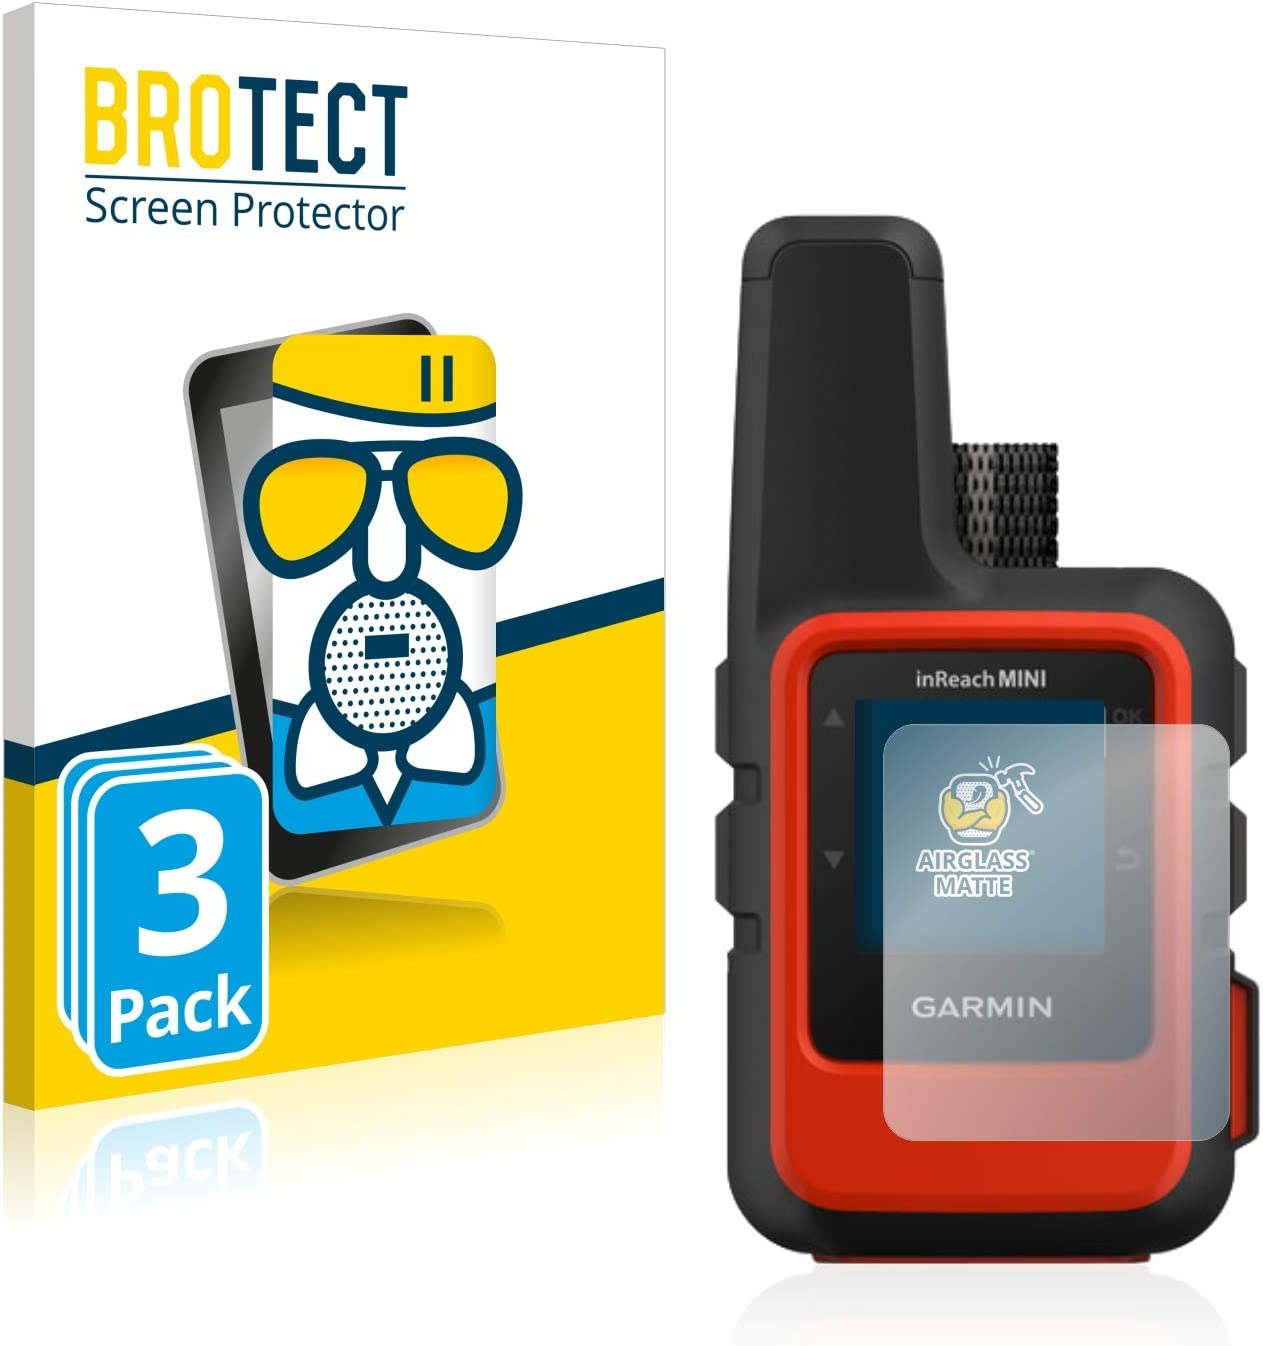 BROTECT Protector Pantalla Cristal Mate Compatible con Garmin inReach Mini Protector Pantalla Anti-Reflejos Vidrio, AirGlass (3 Unidades)